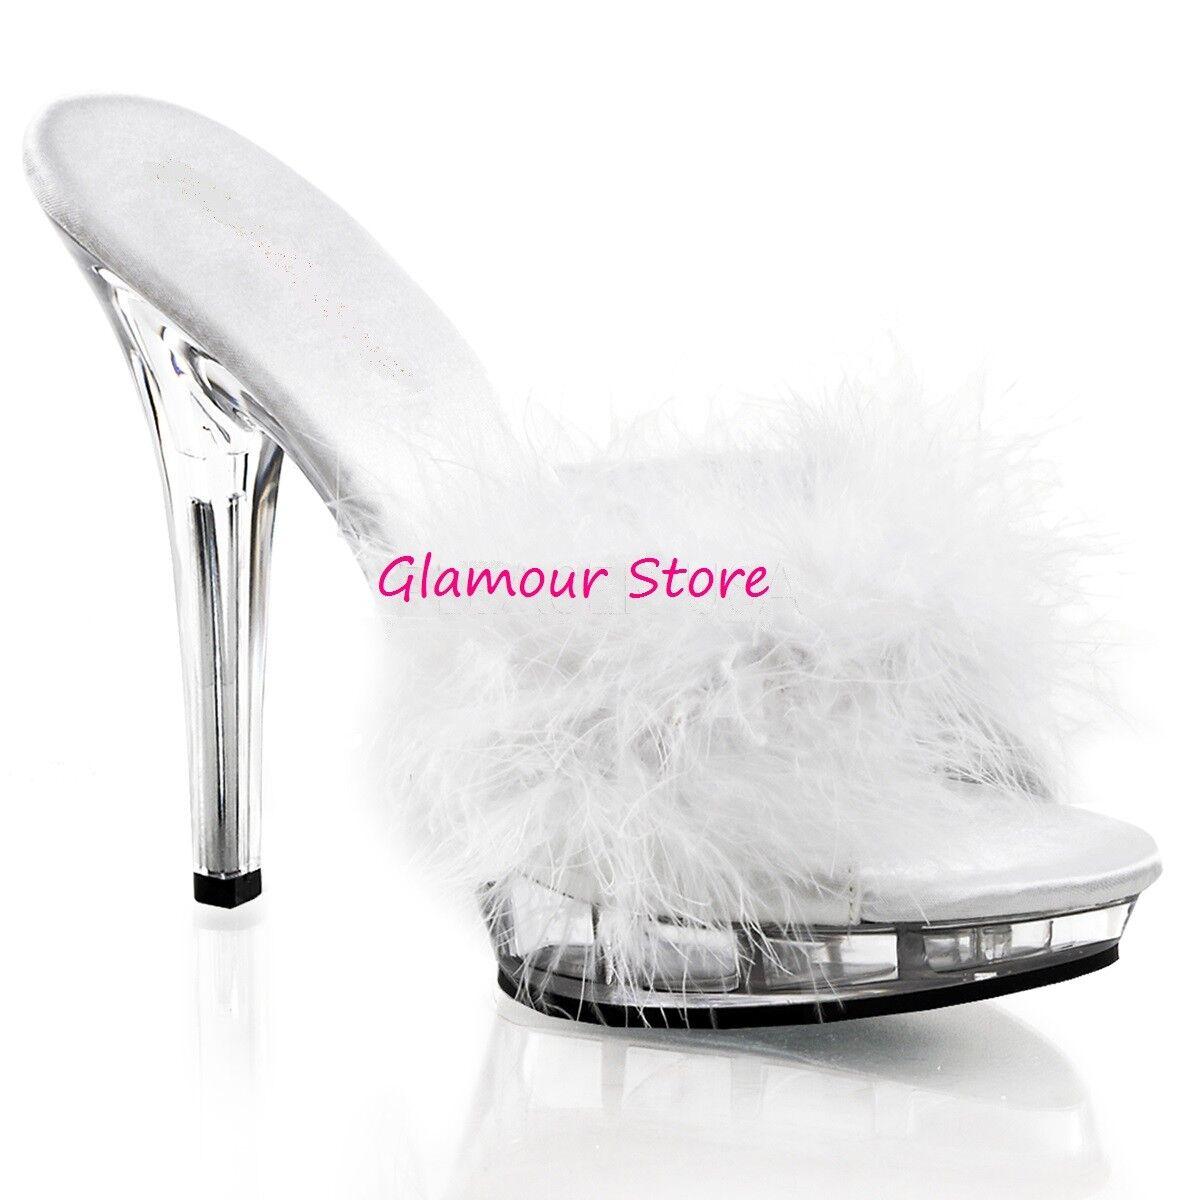 Sexy Sandals Marilyn Feathers  Heel 13 Platform 4 Colorees da 35 a 42 Sabot Glamour  negozio d'offerta